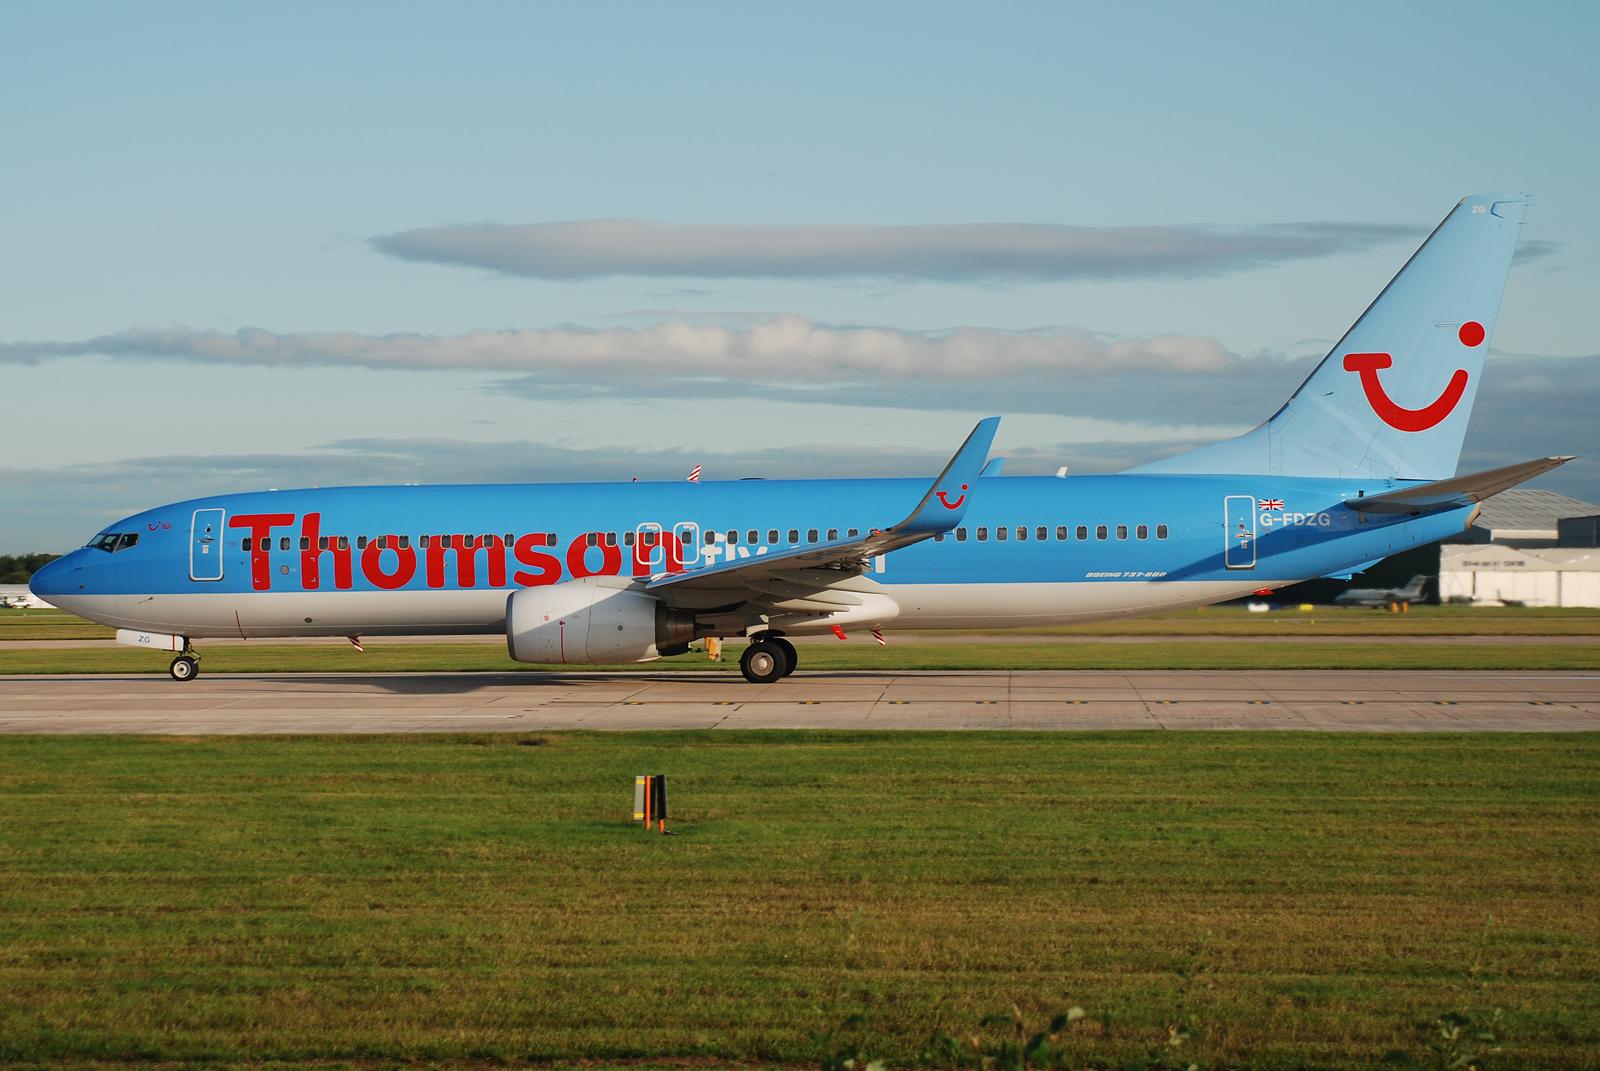 File:Thomsonfly Boeing 737-8K5 G-FDZG at EGCC.jpg - Wikimedia Commons